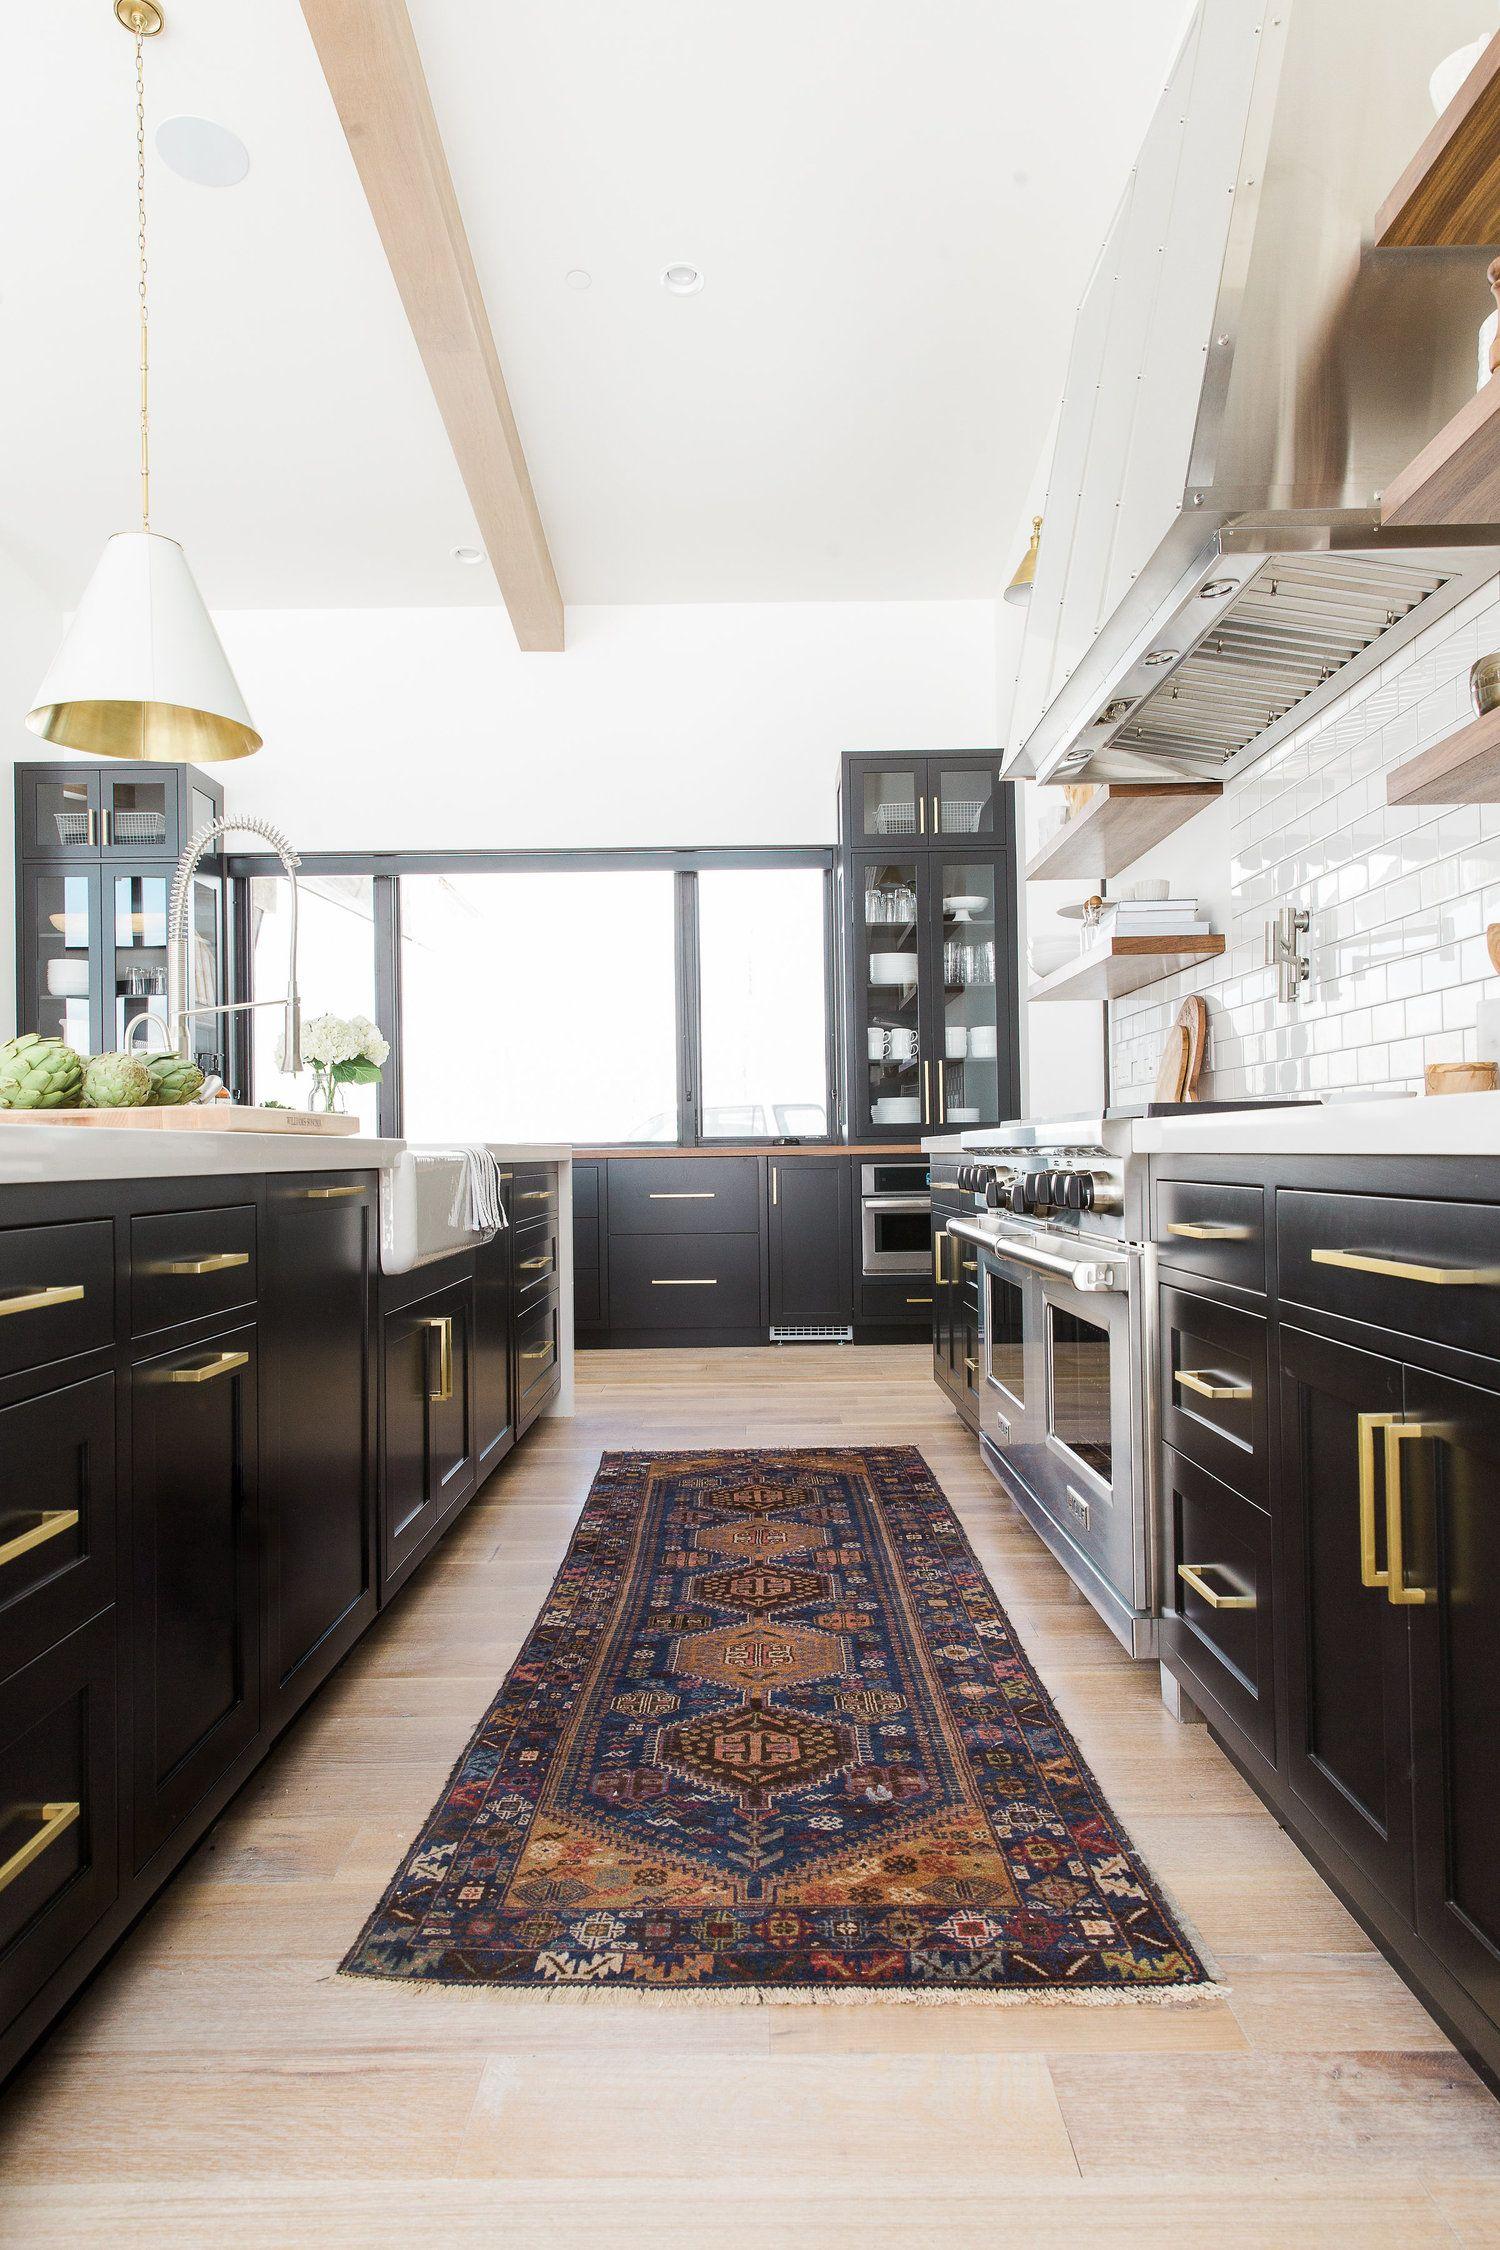 Black and white kitchen vintage rug